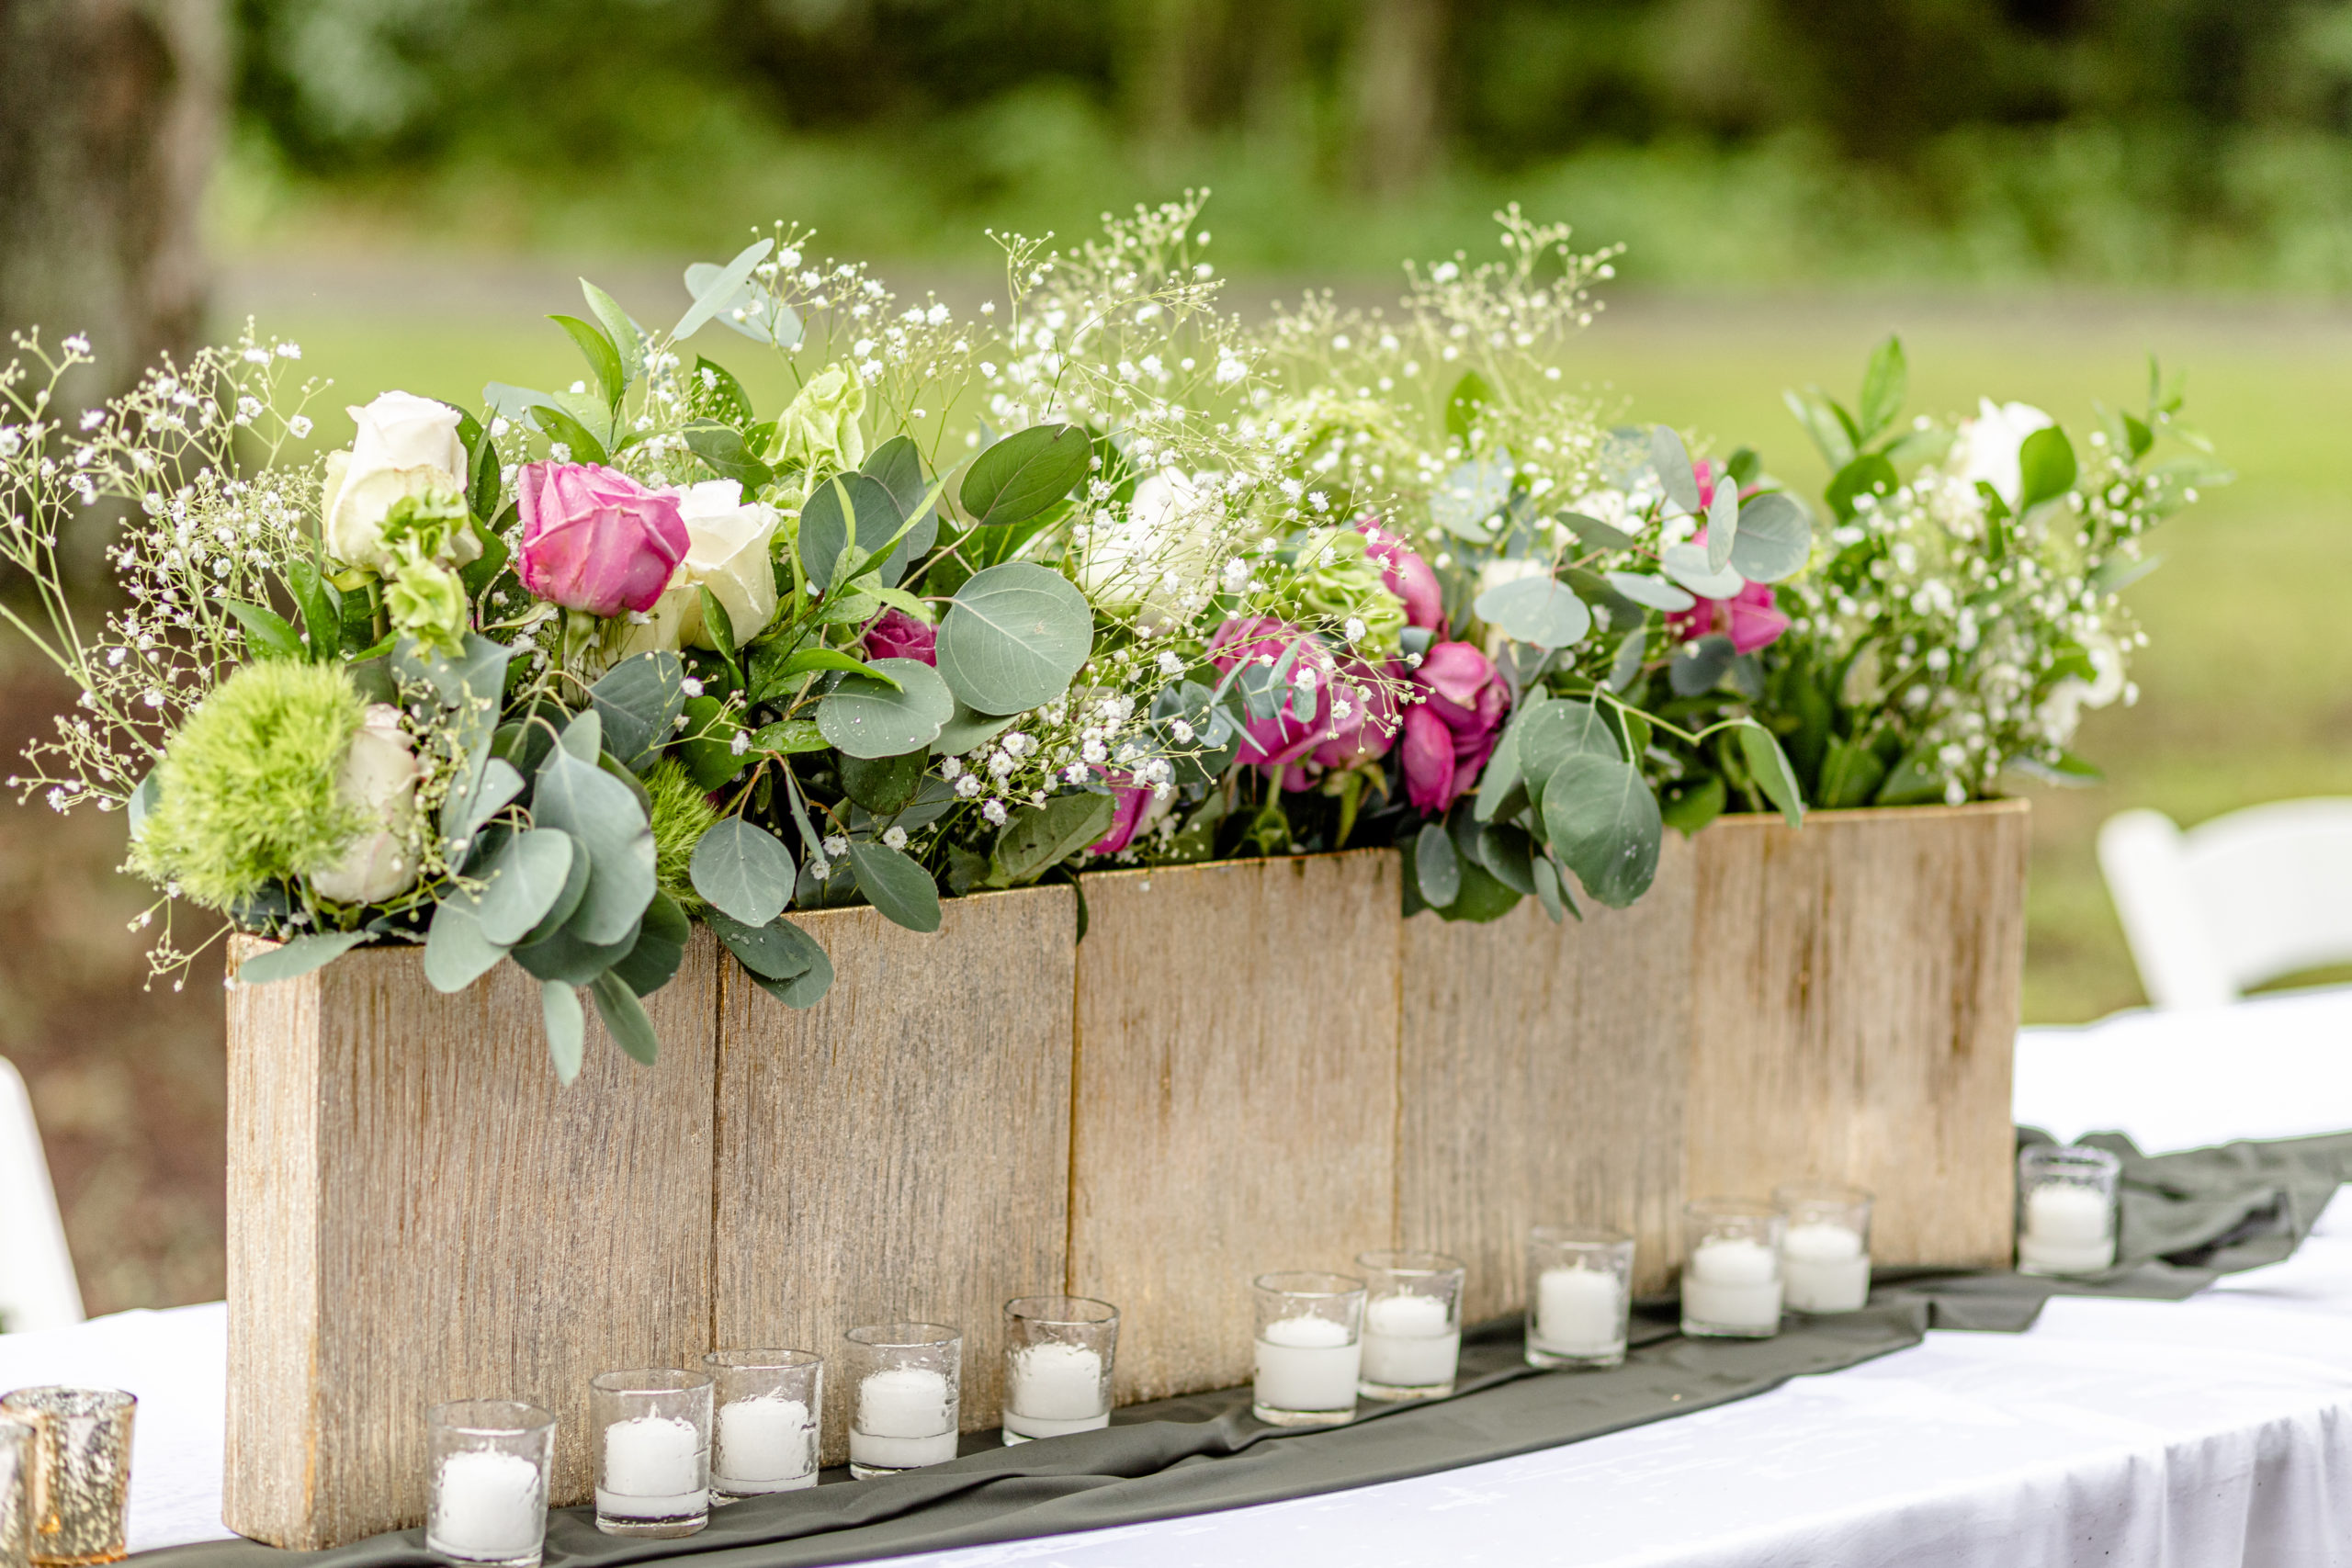 wedding florals, wedding greenery, wedding centerpieces, wedding succulents, pink and green wedding flowers, pink and green wedding centerpieces, wedding table arrangements